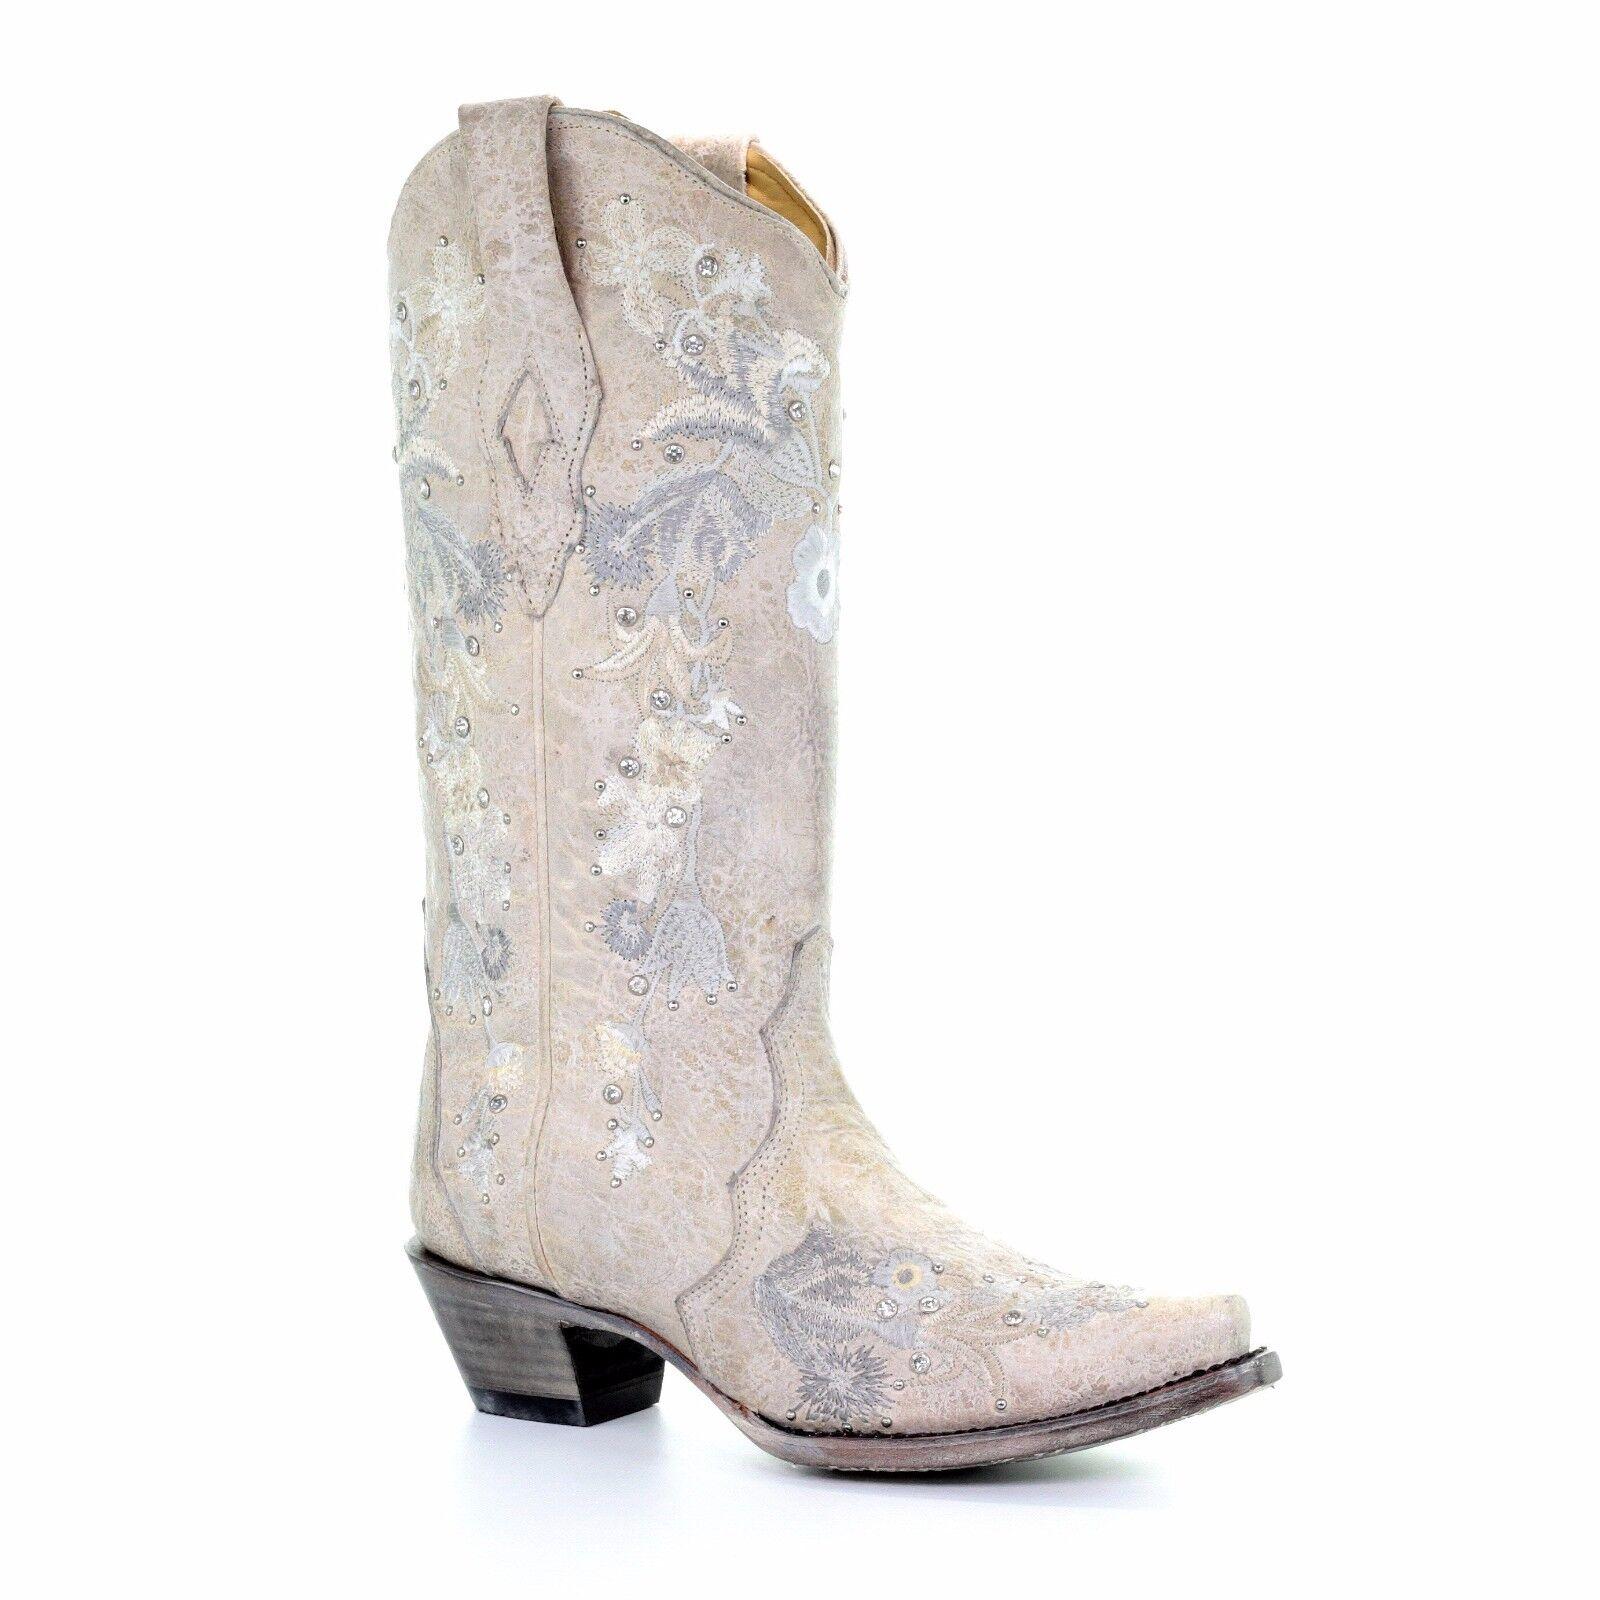 alta qualità Corral Ladies Ladies Ladies bianca Floral Embroidery & Crystals Wedding stivali A3521  online al miglior prezzo